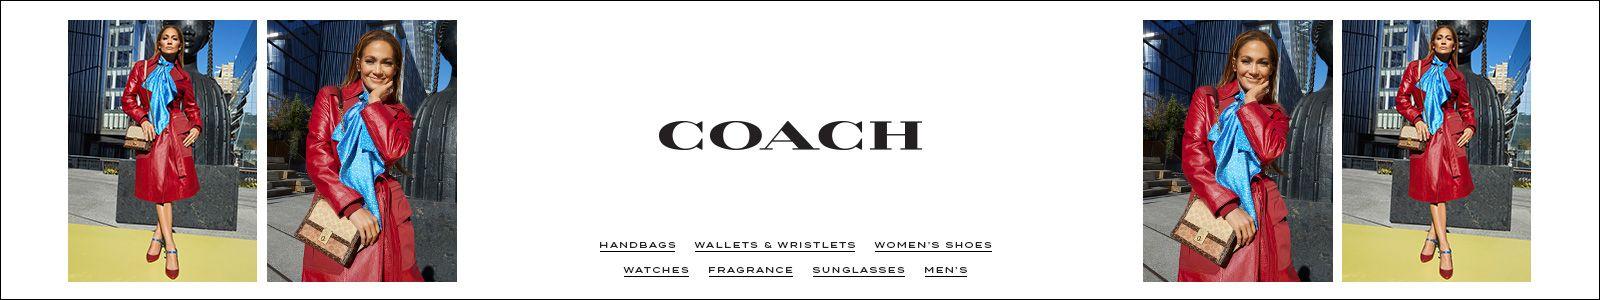 Coach, Handbags, Wallets and Wristlets, Women's Shoes, Watches, Fragrance, Sunglasses, Men's